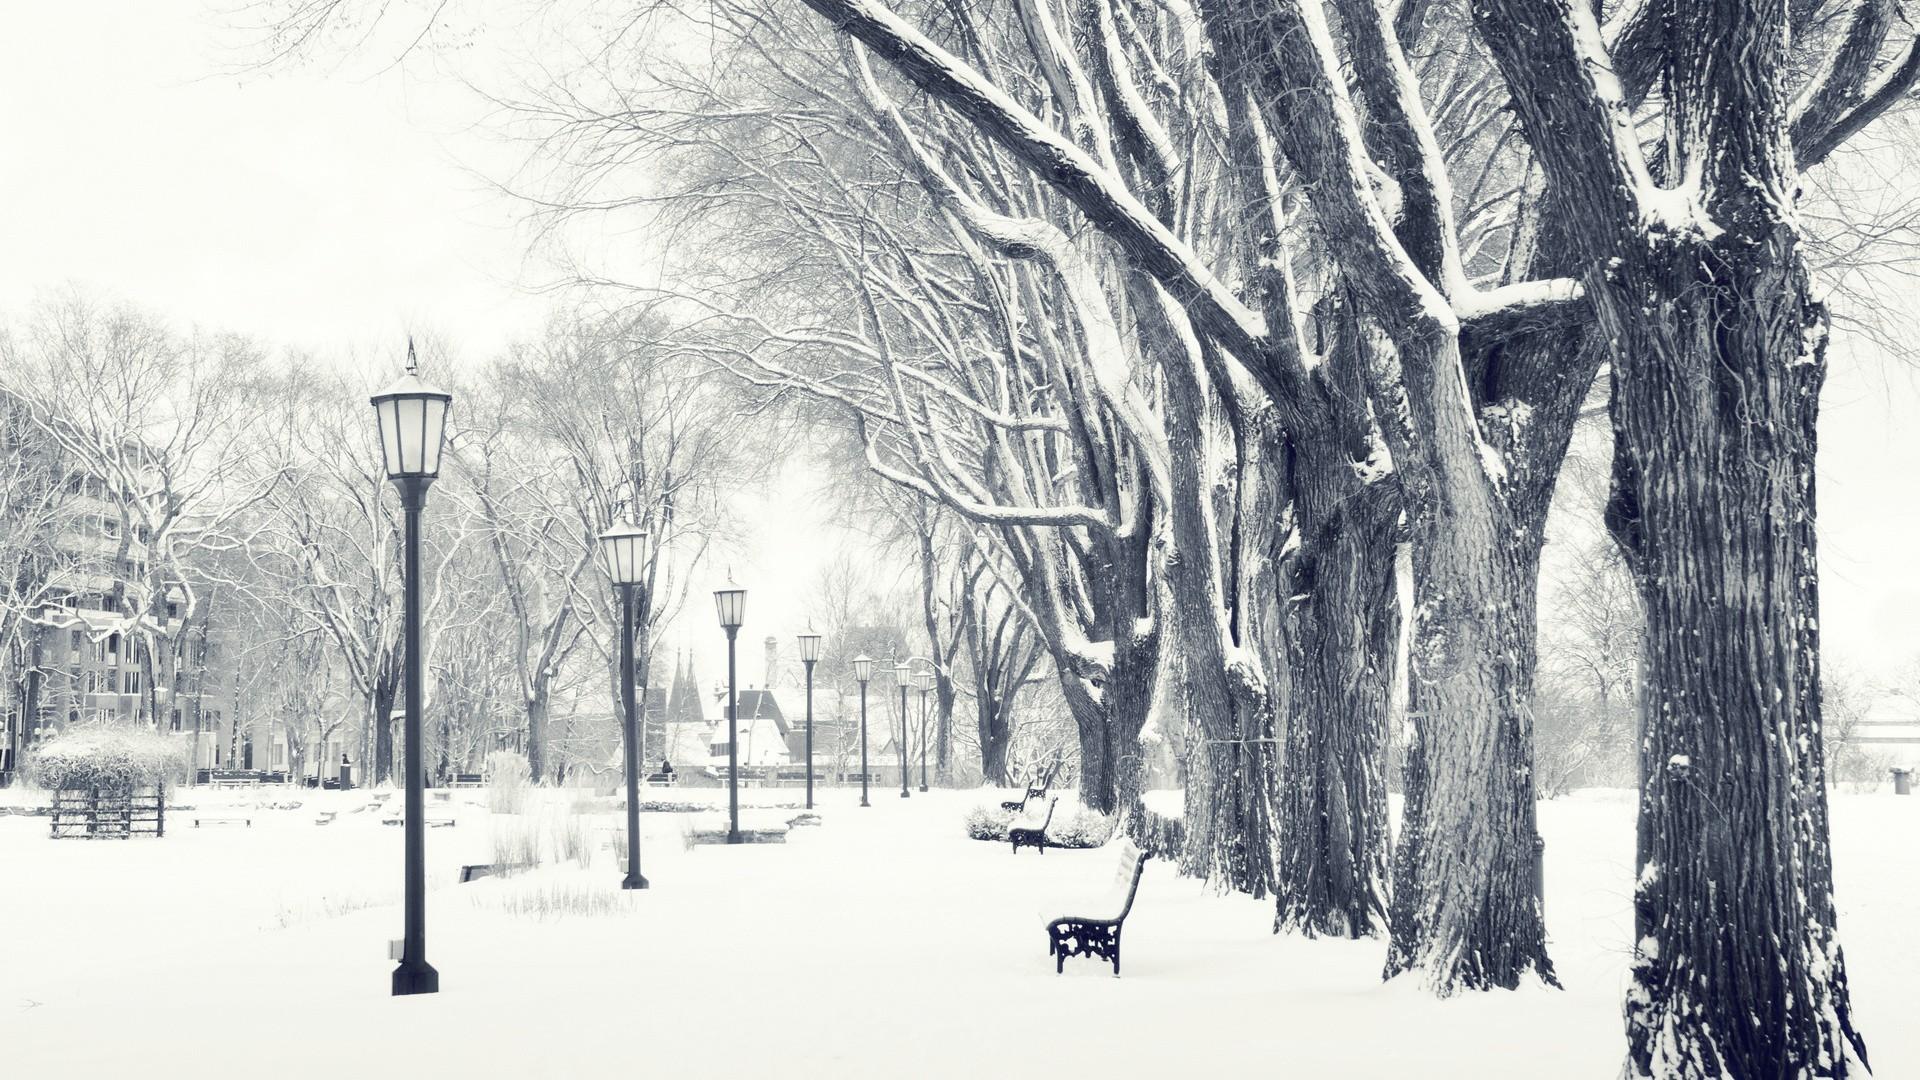 Res: 1920x1080, Snowy Trees Wallpaper HD